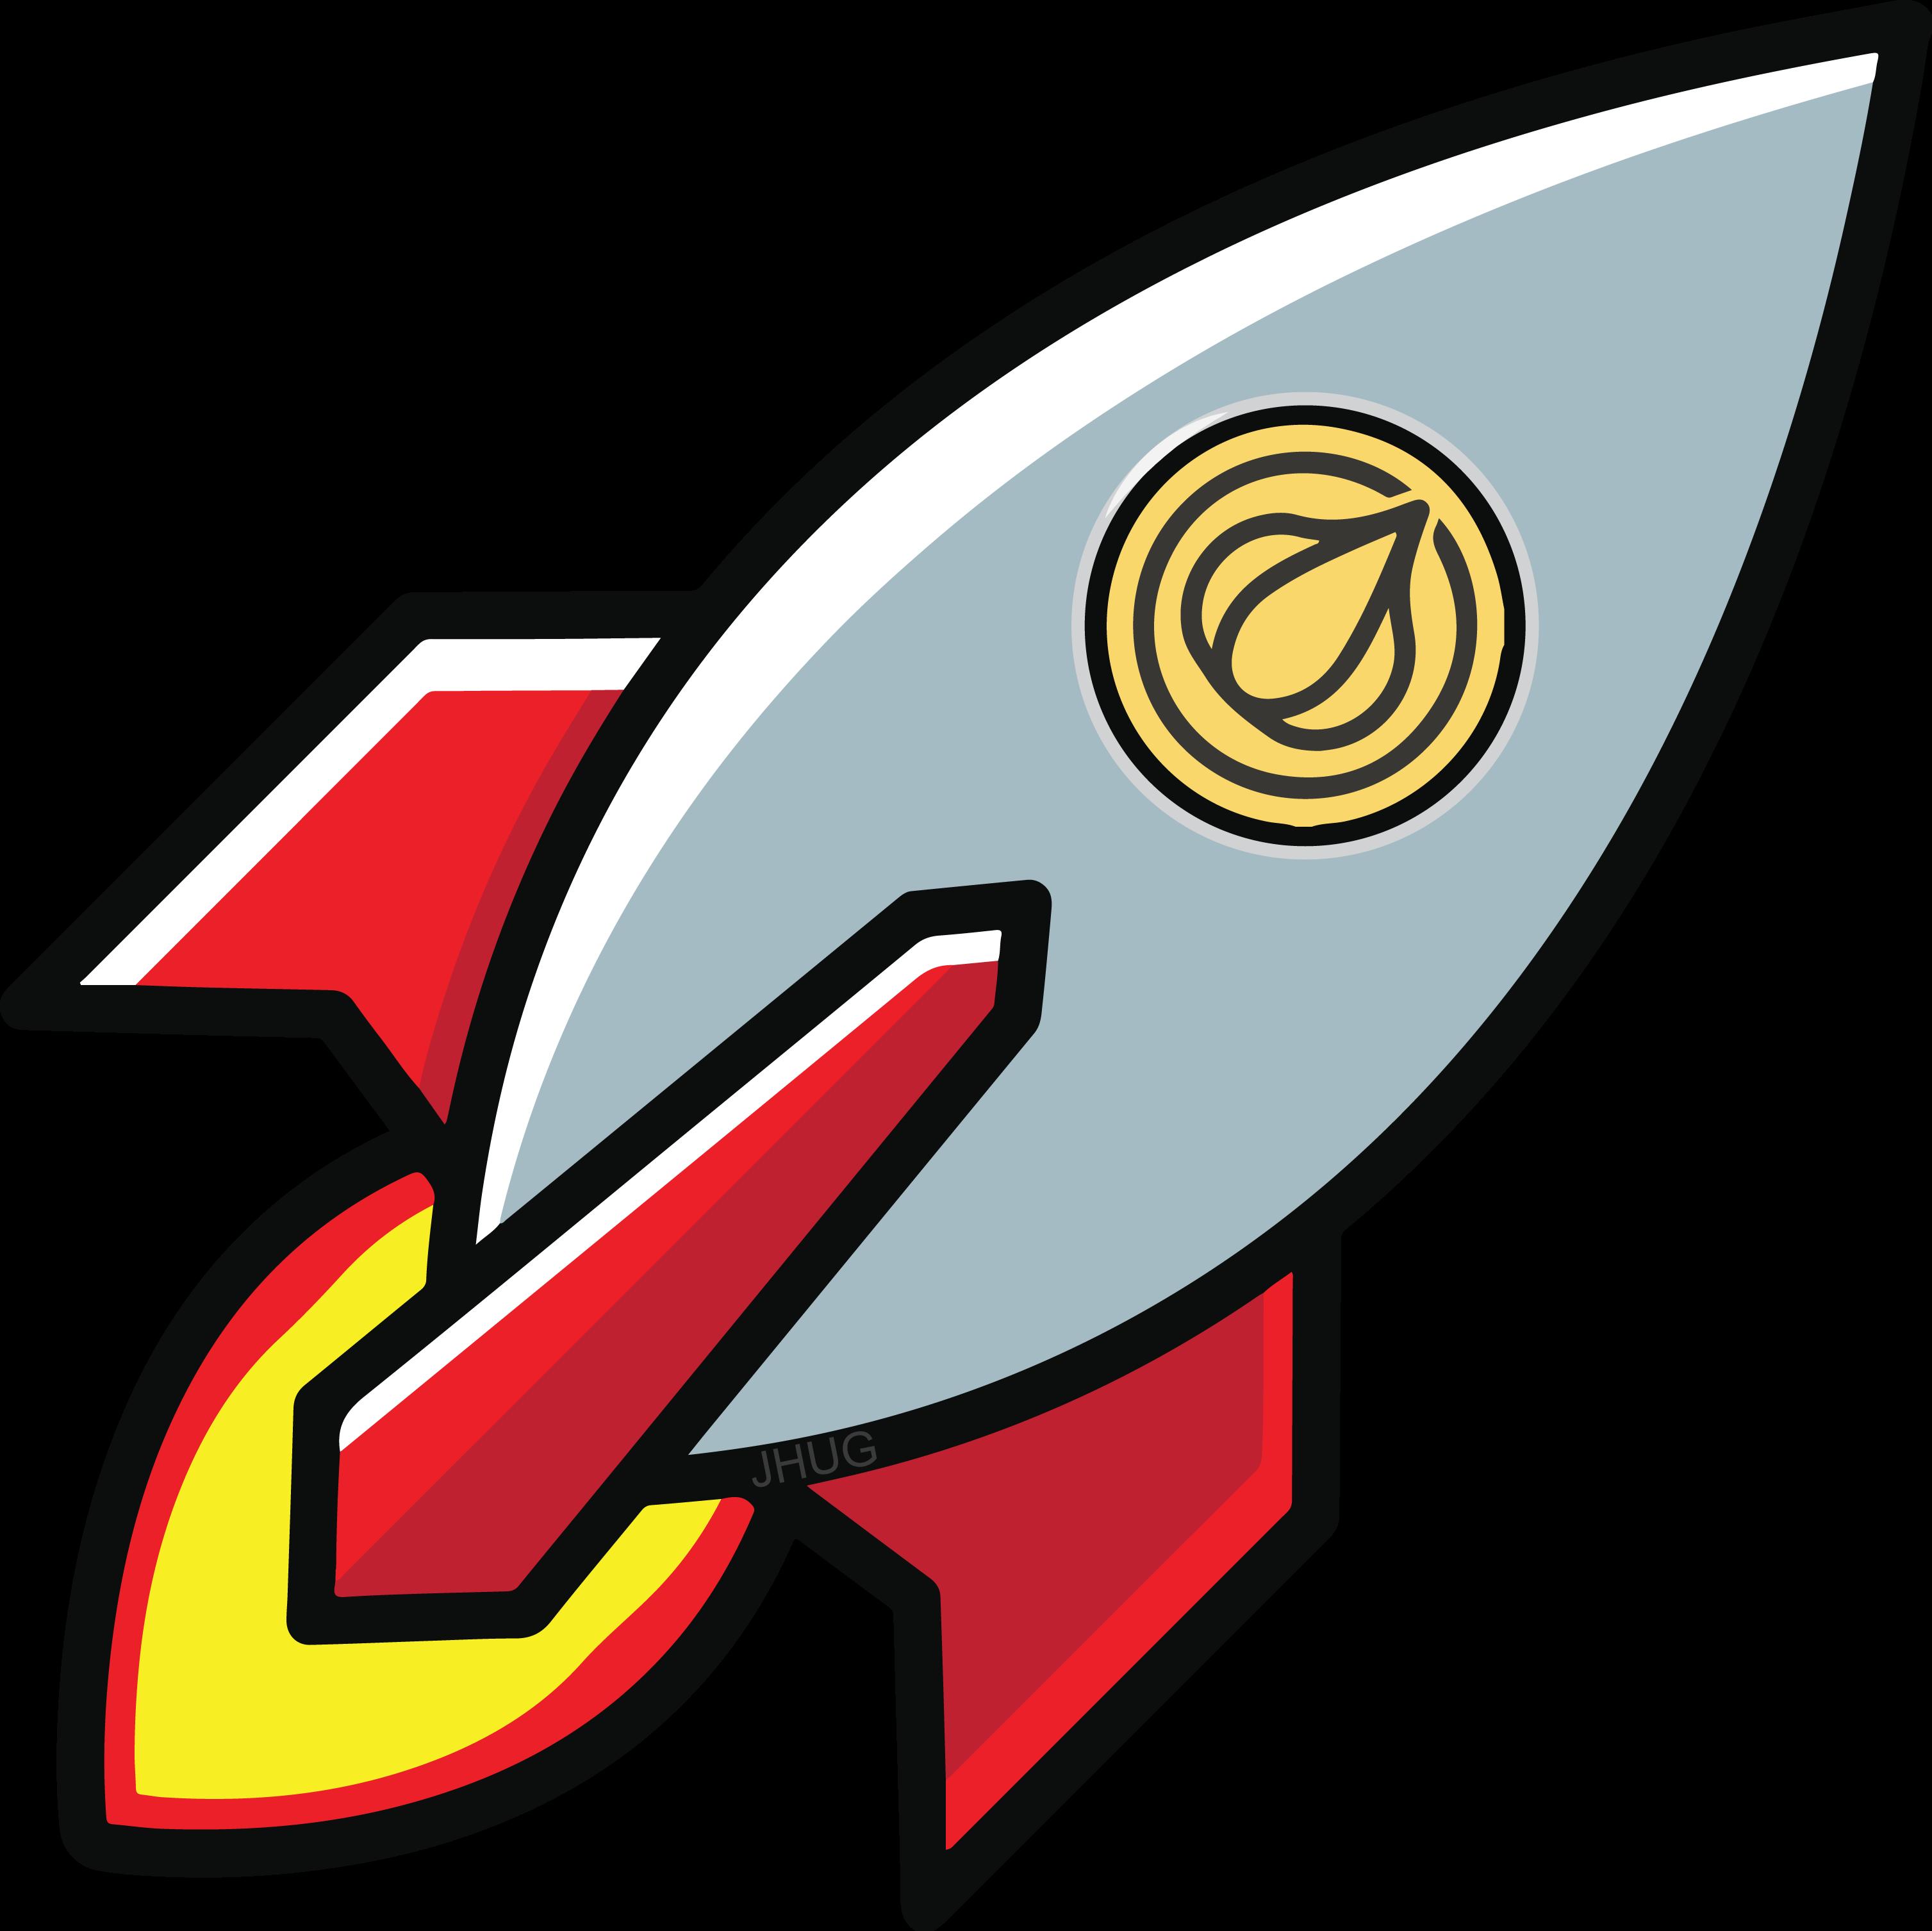 New emoji for your. Clipart rocket crash